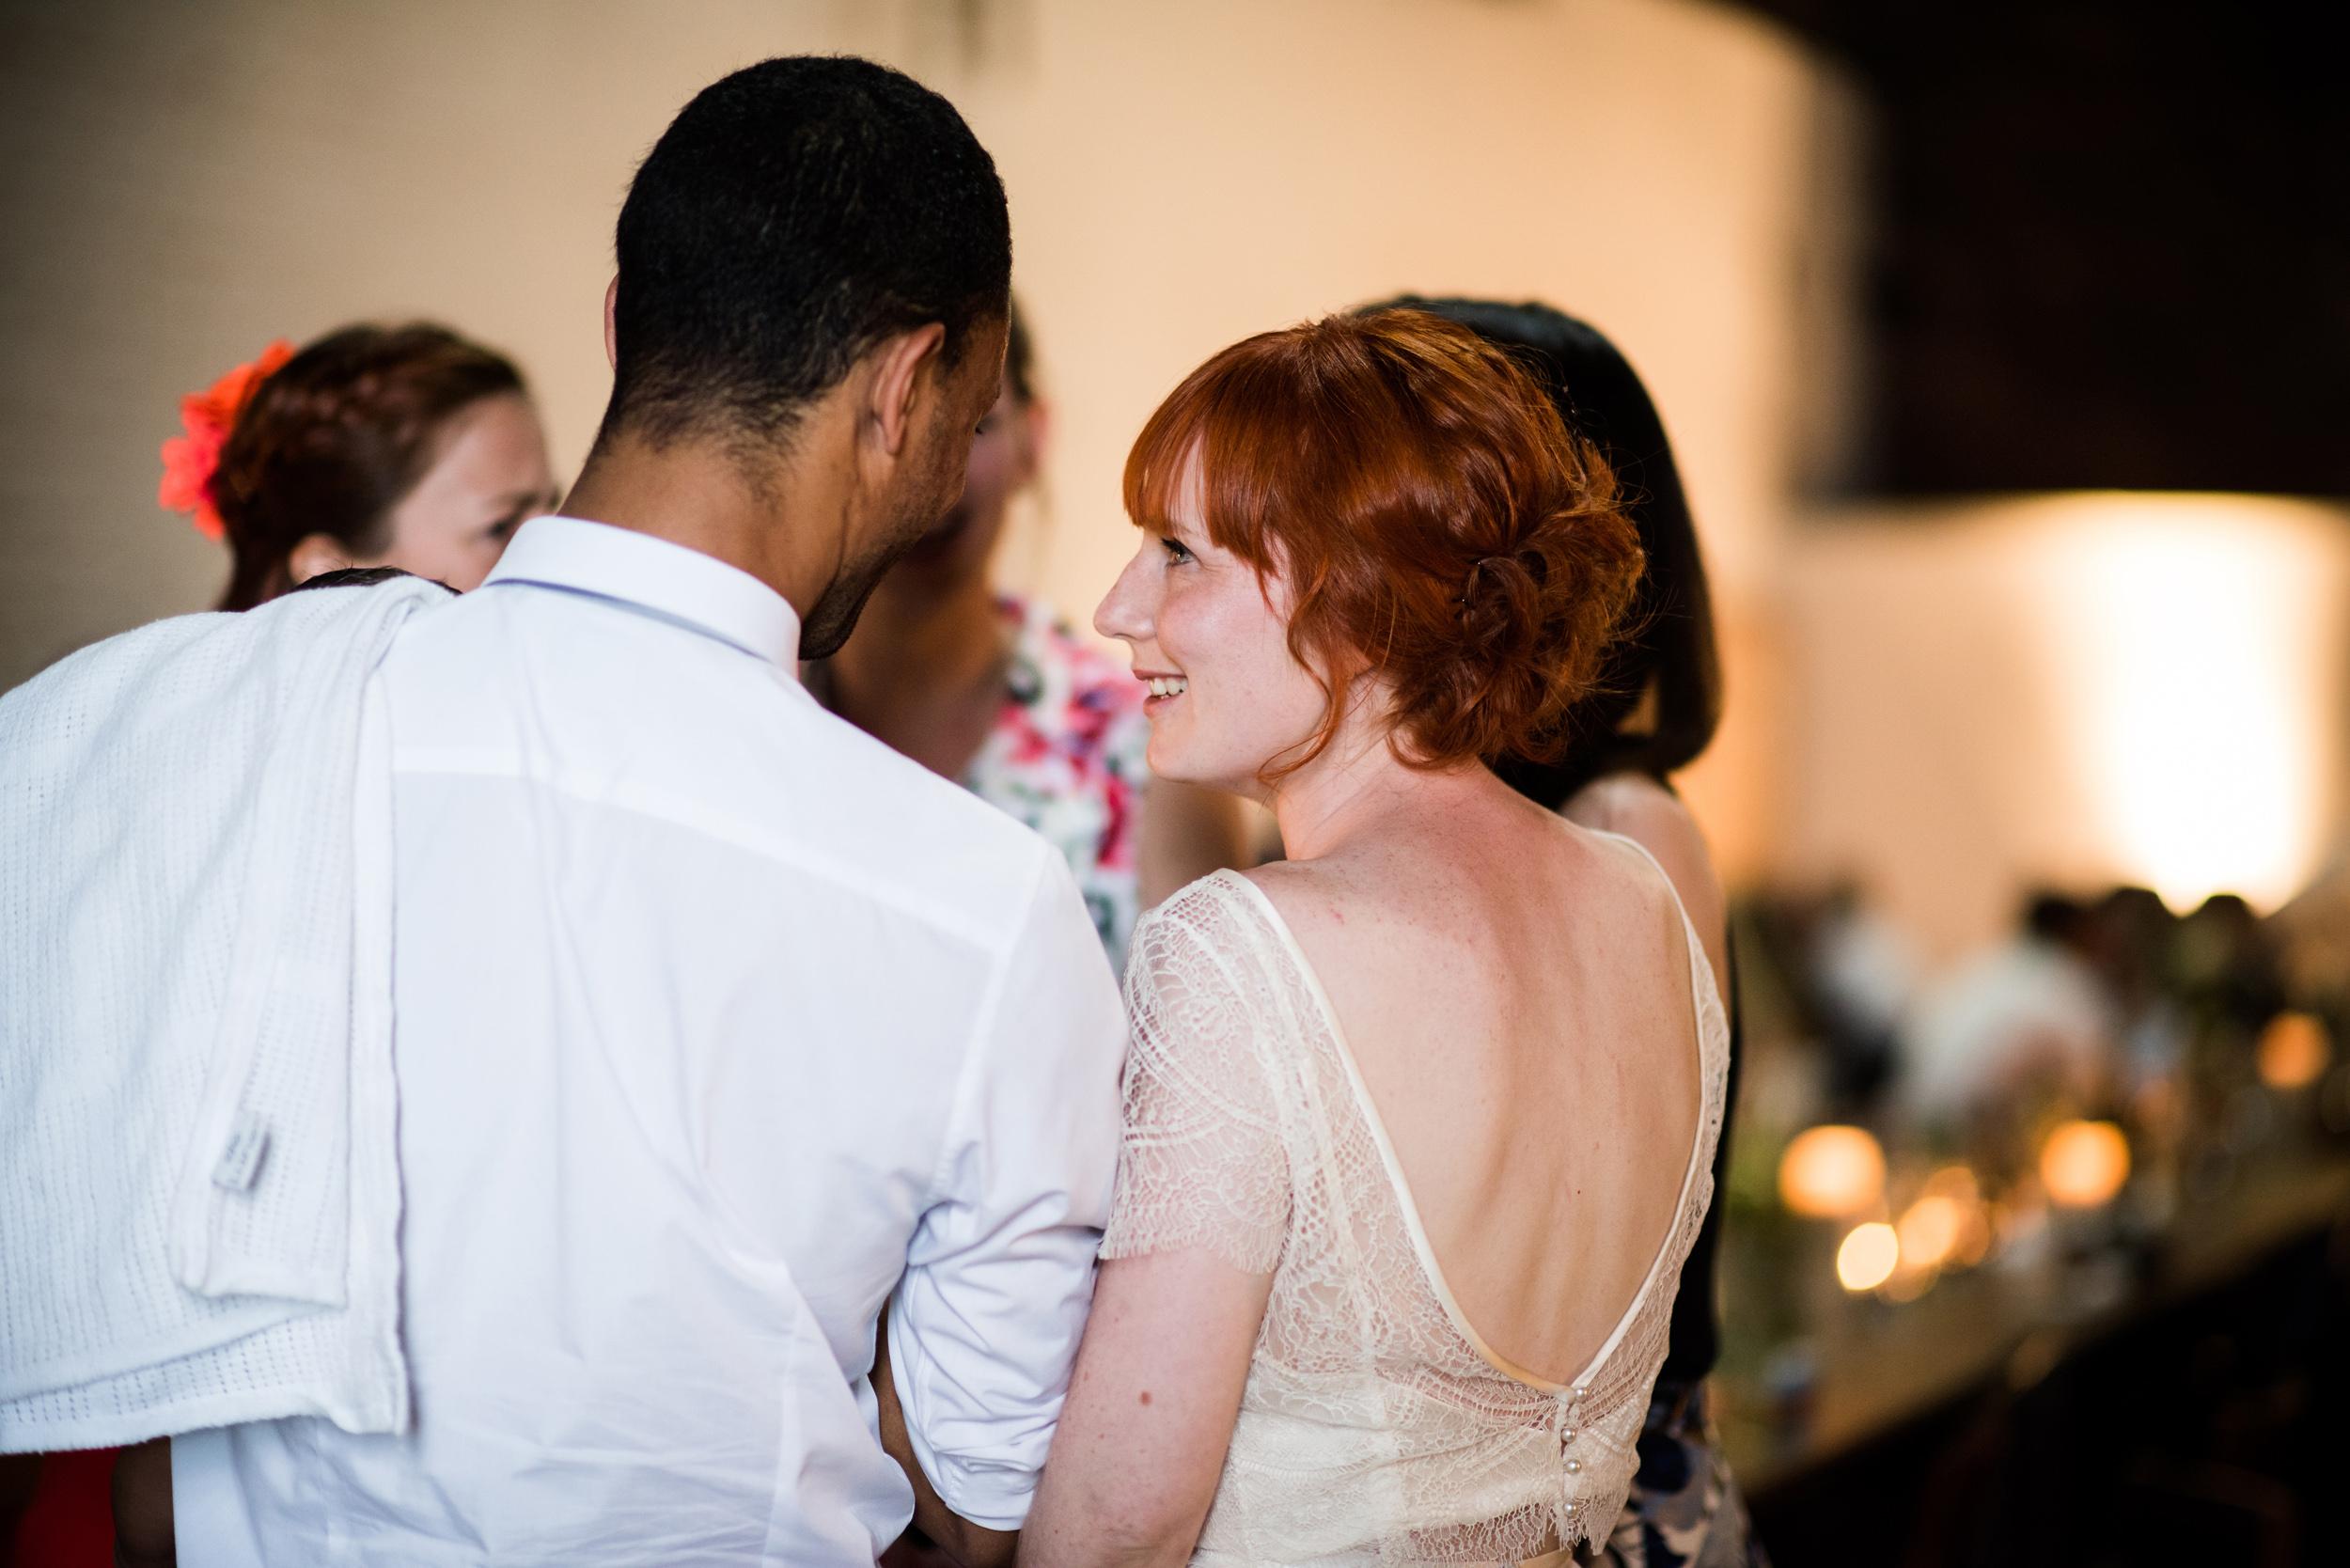 Jill-Kate-Beaumont-Lace-Sheffield-Wedding-23.jpg